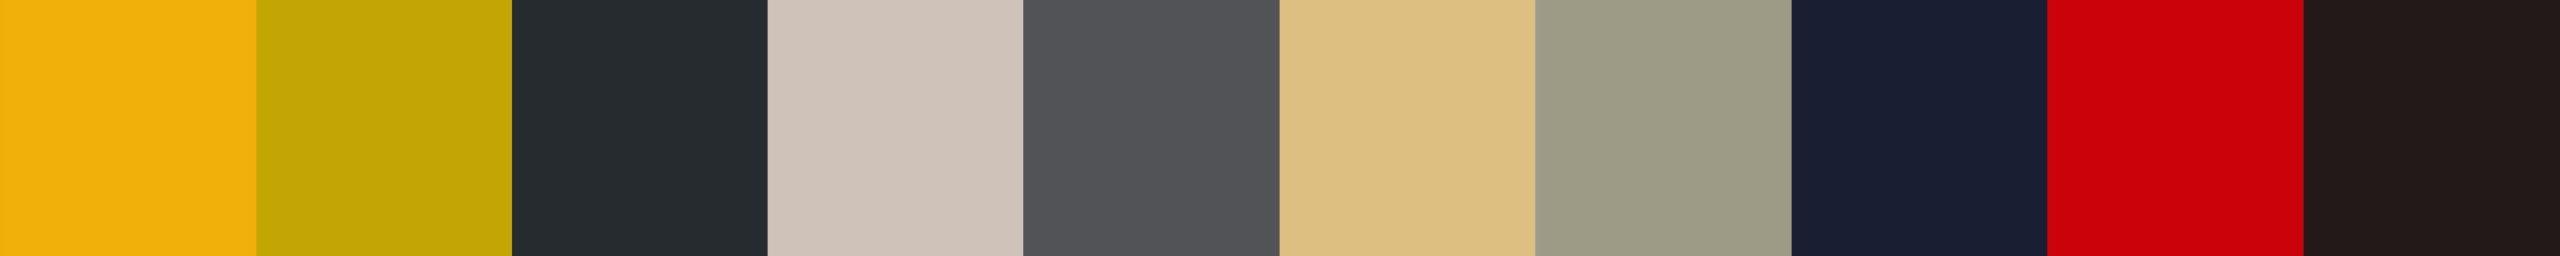 392 Fedialistica Color Palette